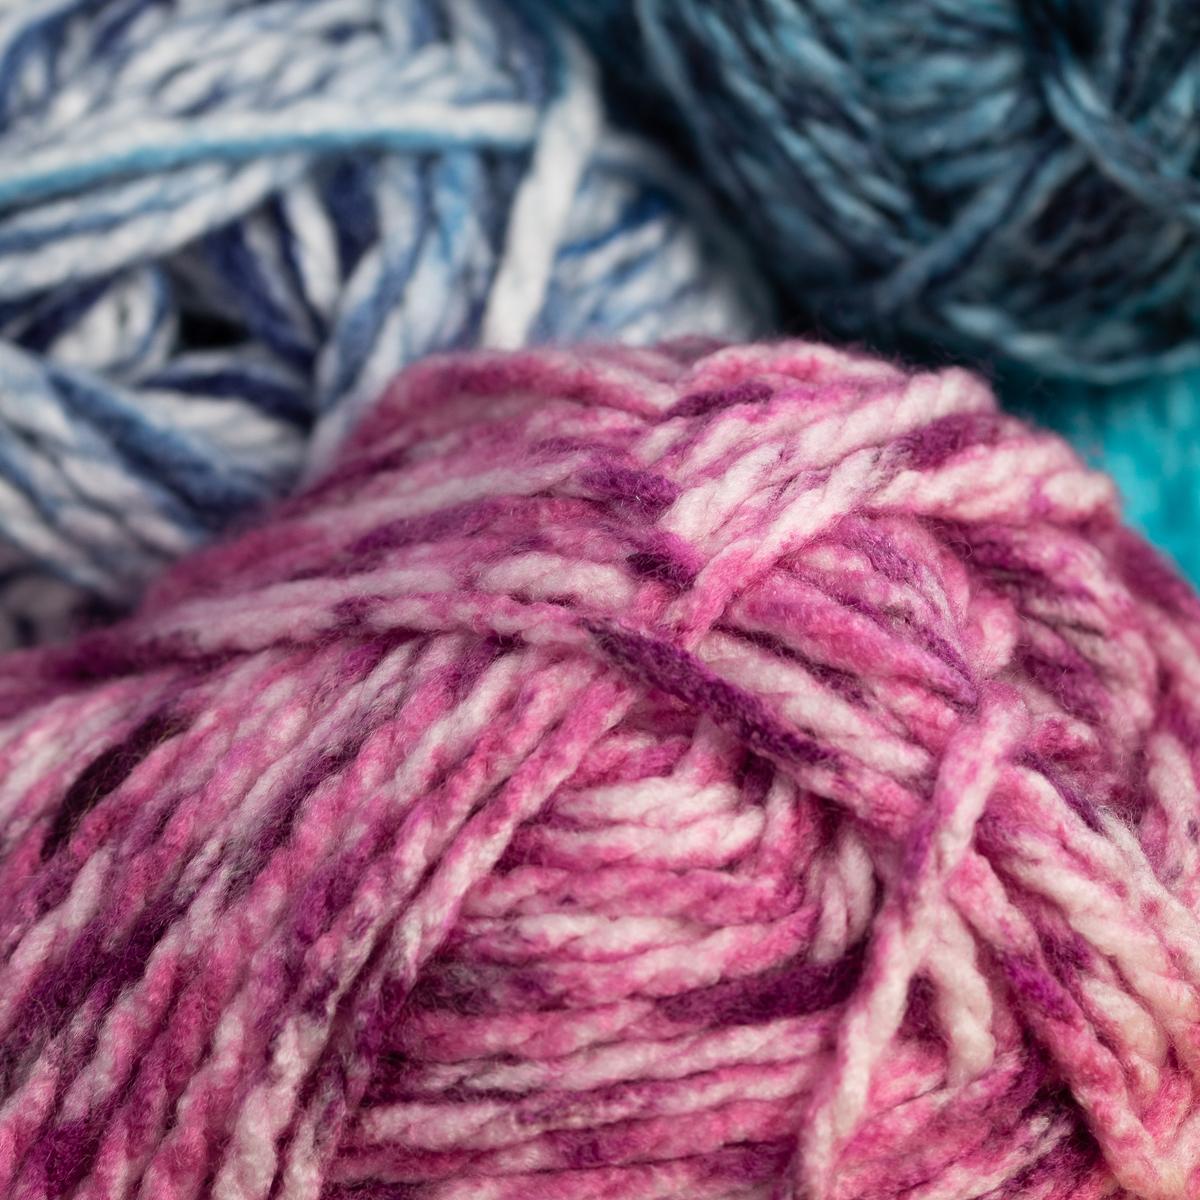 3pk-Premier-Yarns-Deborah-Norville-Serenity-100-Acrylic-Yarn-Chunky-5-Knitting thumbnail 54